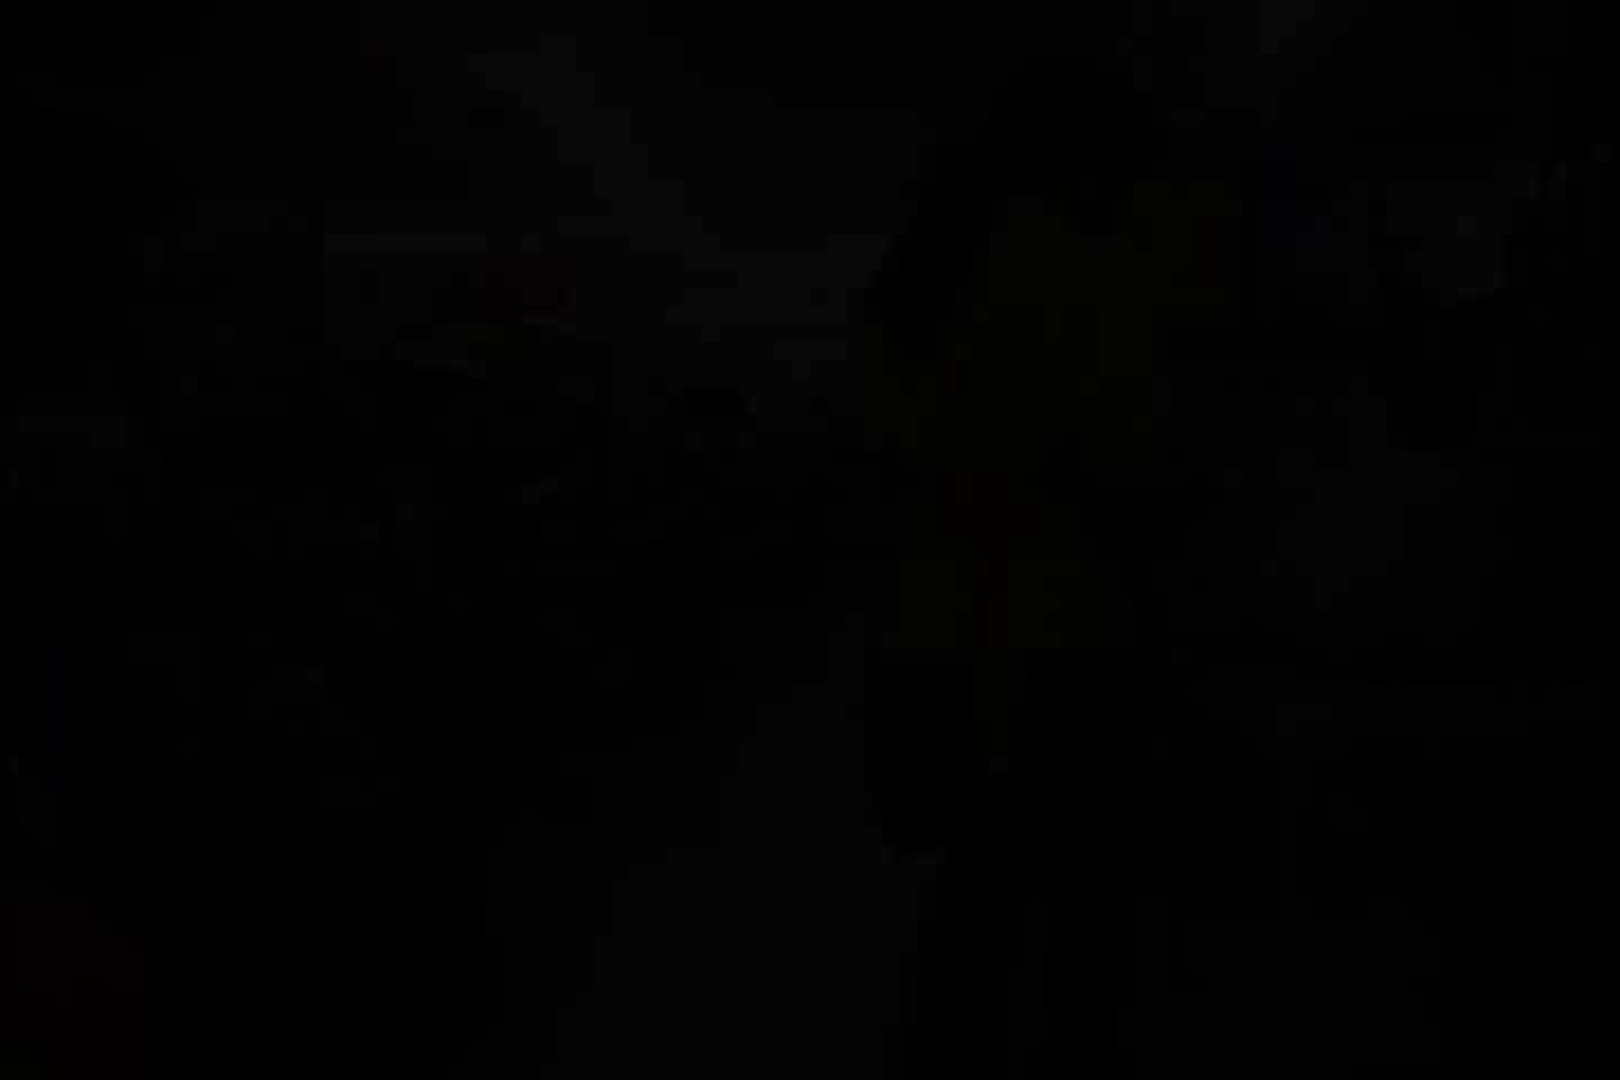 本日の大!!特選Vol.2 盗撮 性交動画流出 79PICs 53